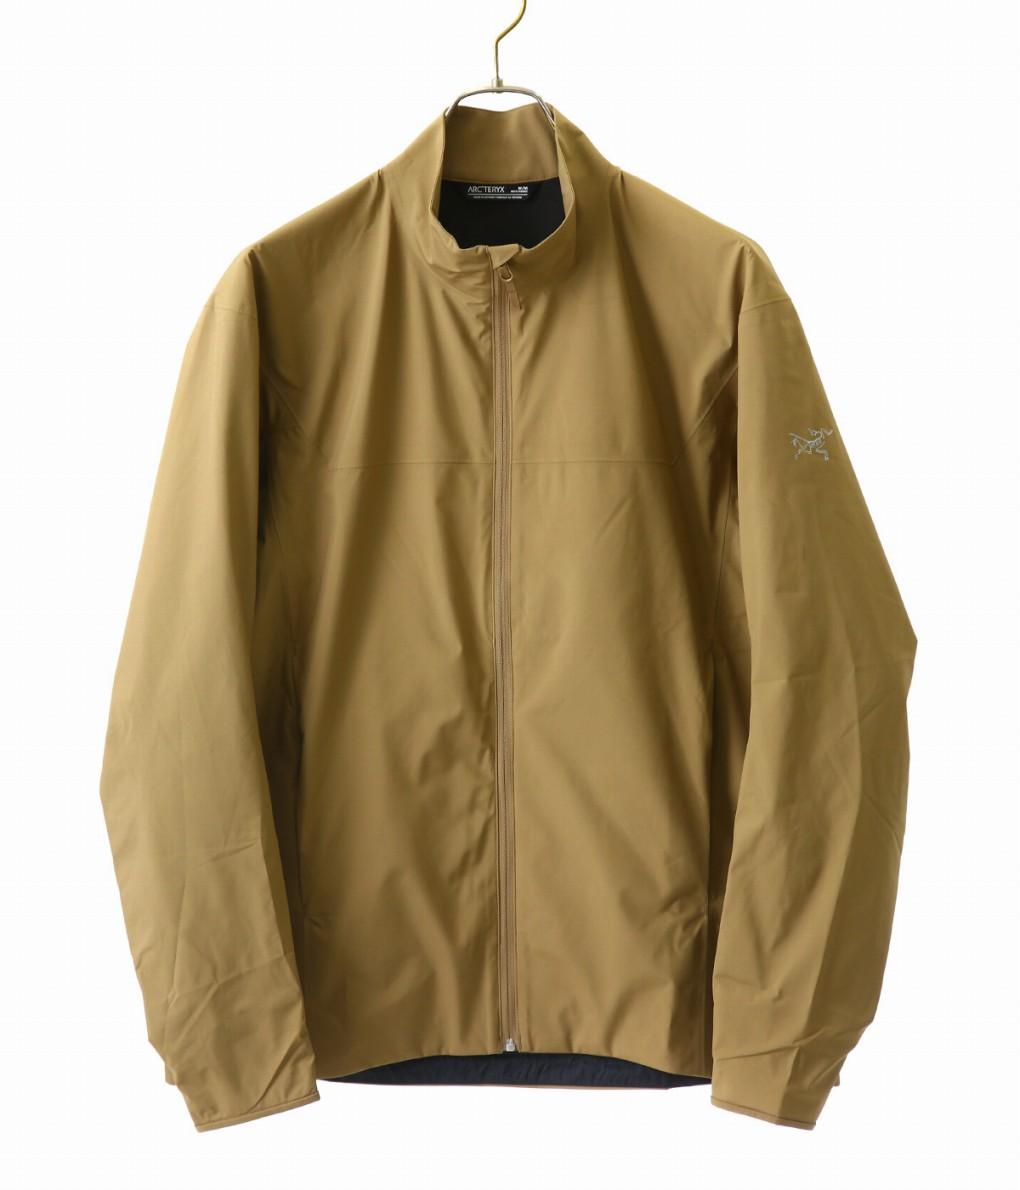 ARC'TERYX / アークテリクス : Solano Jacket Men's : スポーツ アークテリクス ジャケット メンズ : L07151000 【STD】